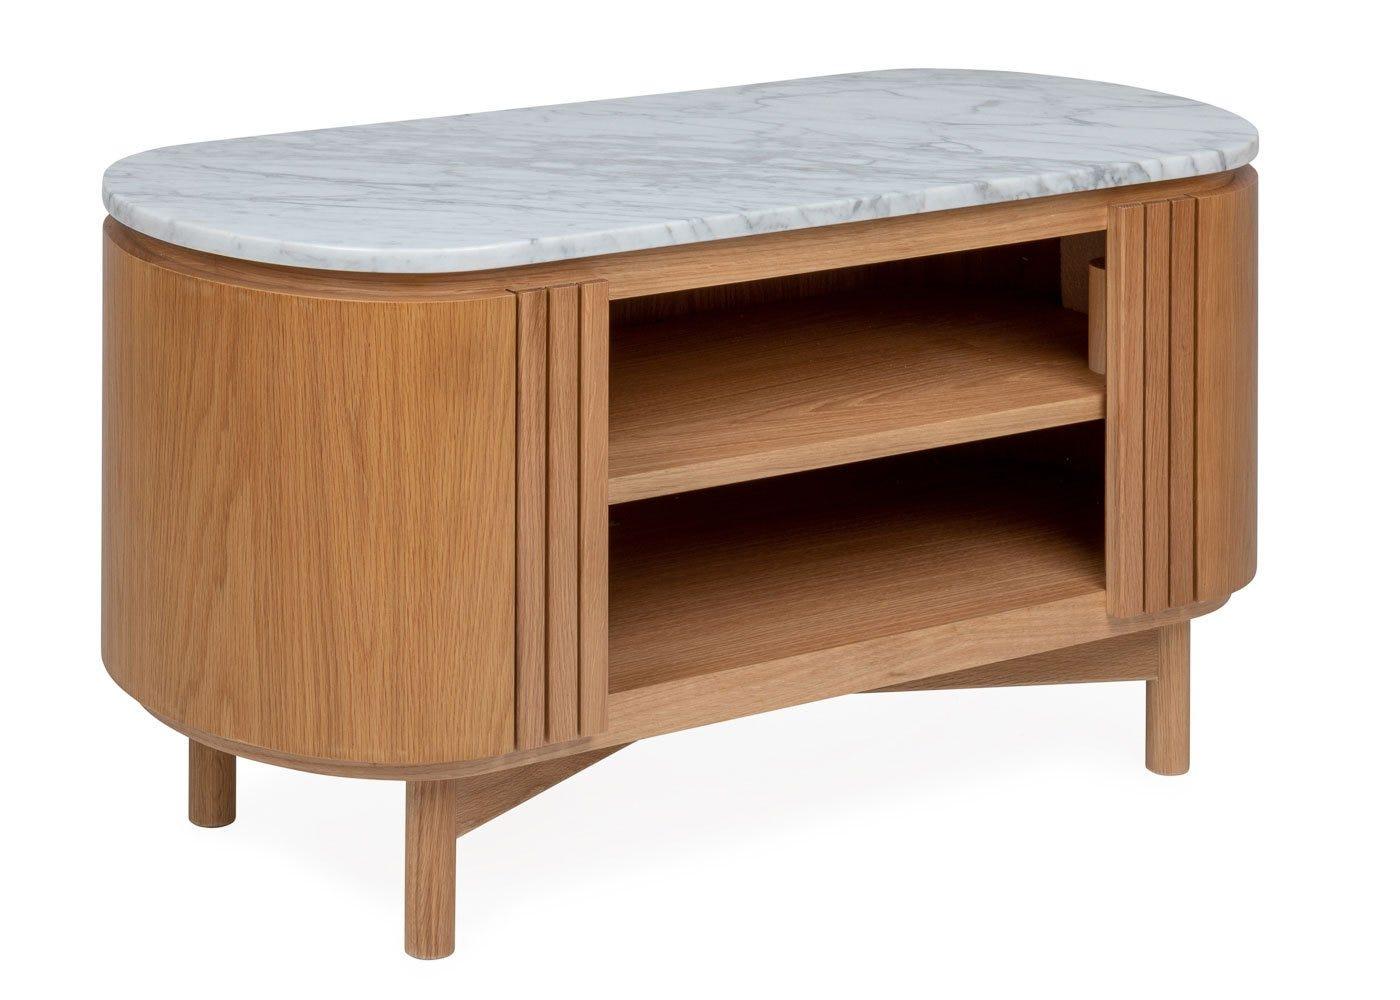 Remi AV unit oak and white marble top small.